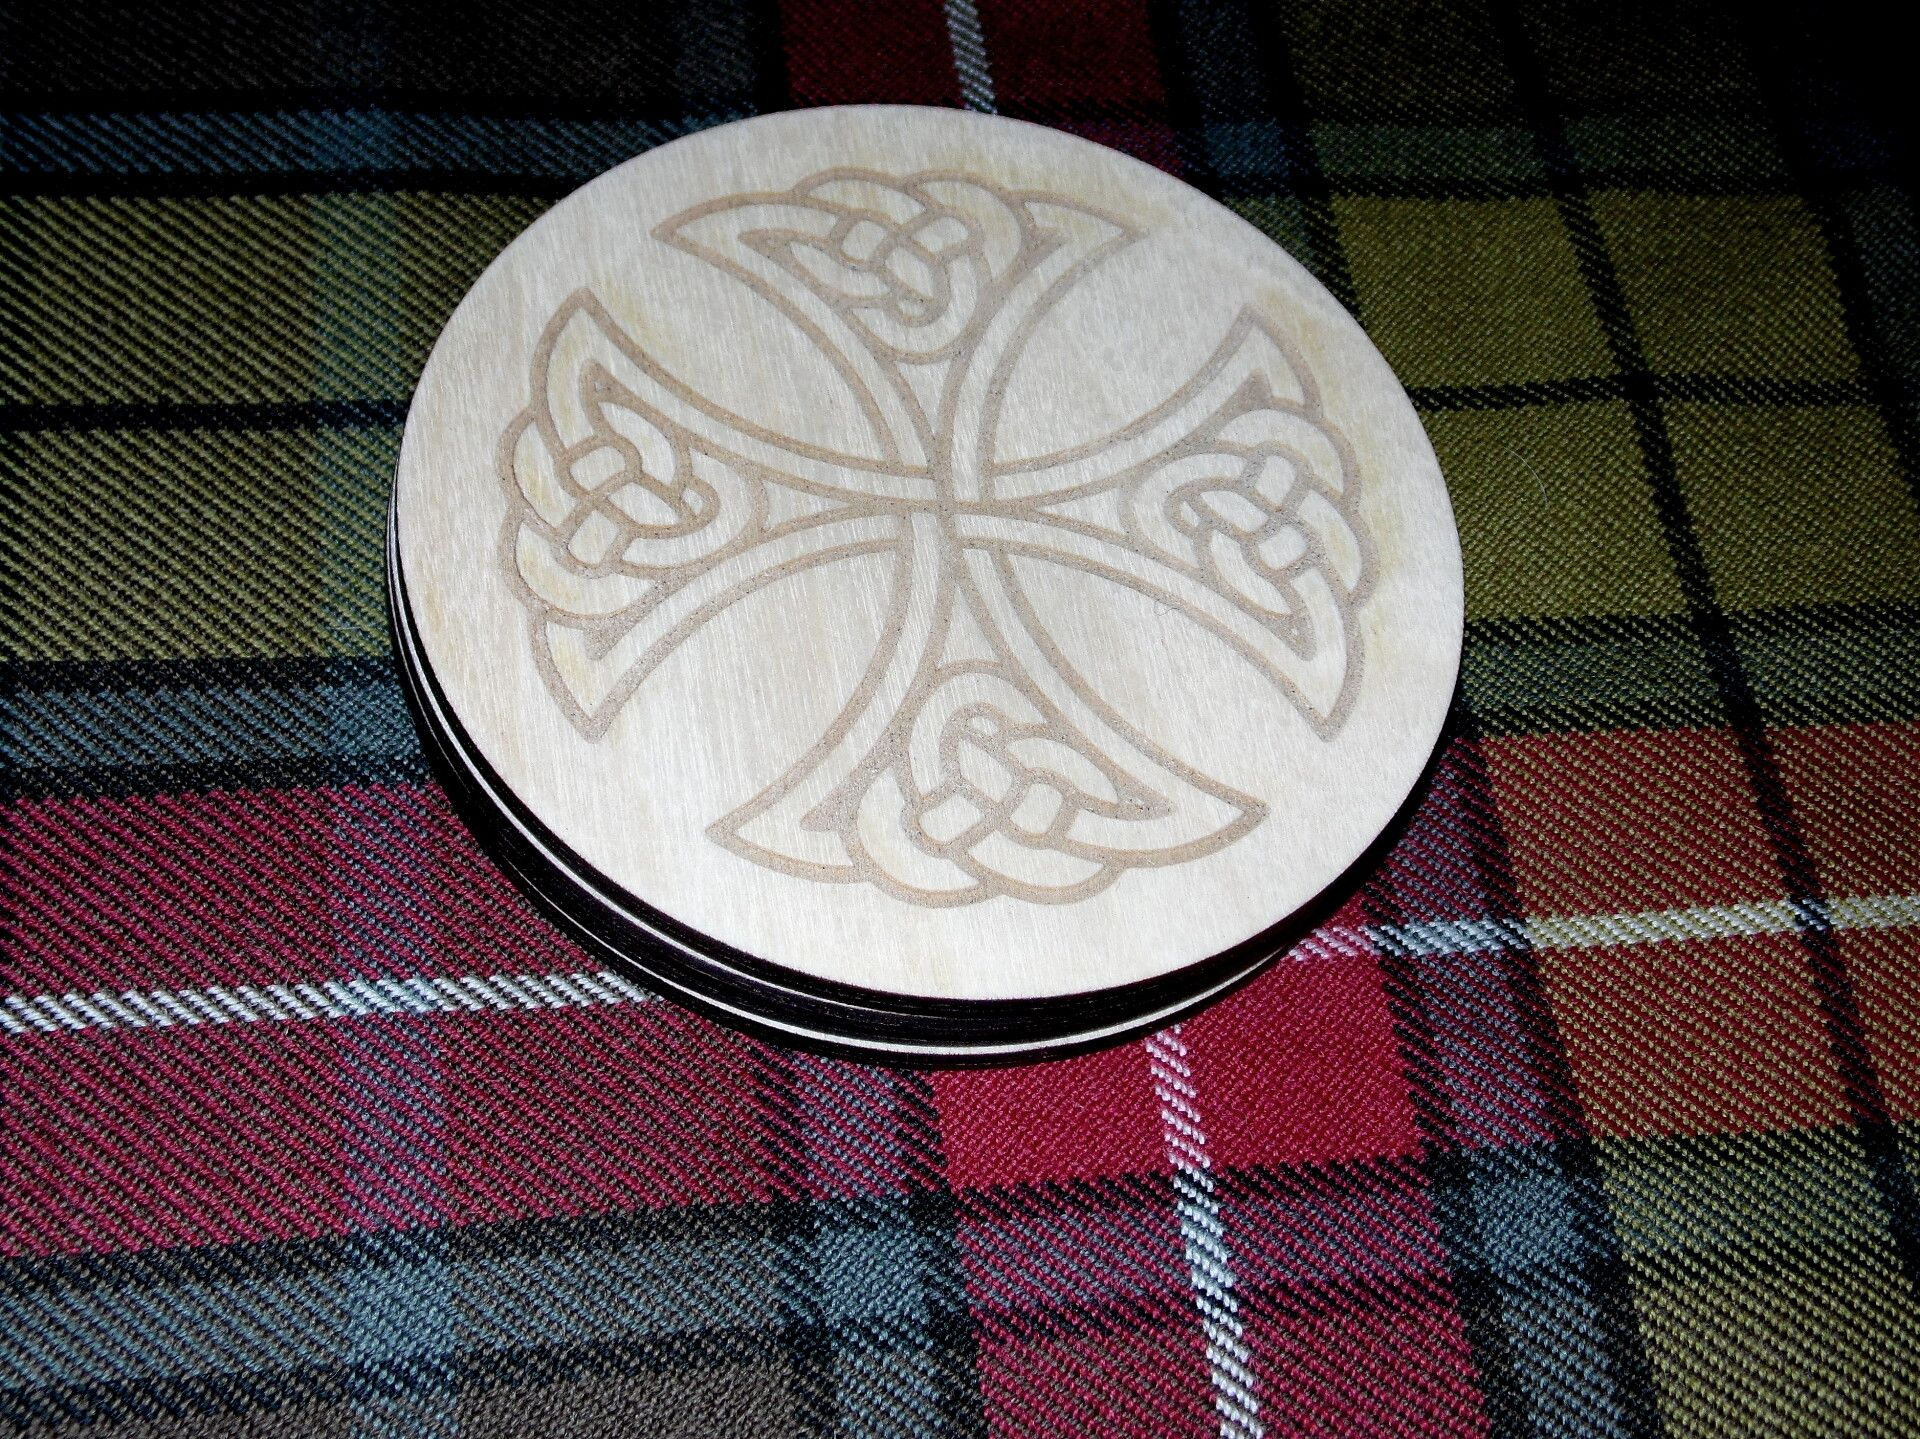 Celtic Cross #2 engraved coaster set x 4